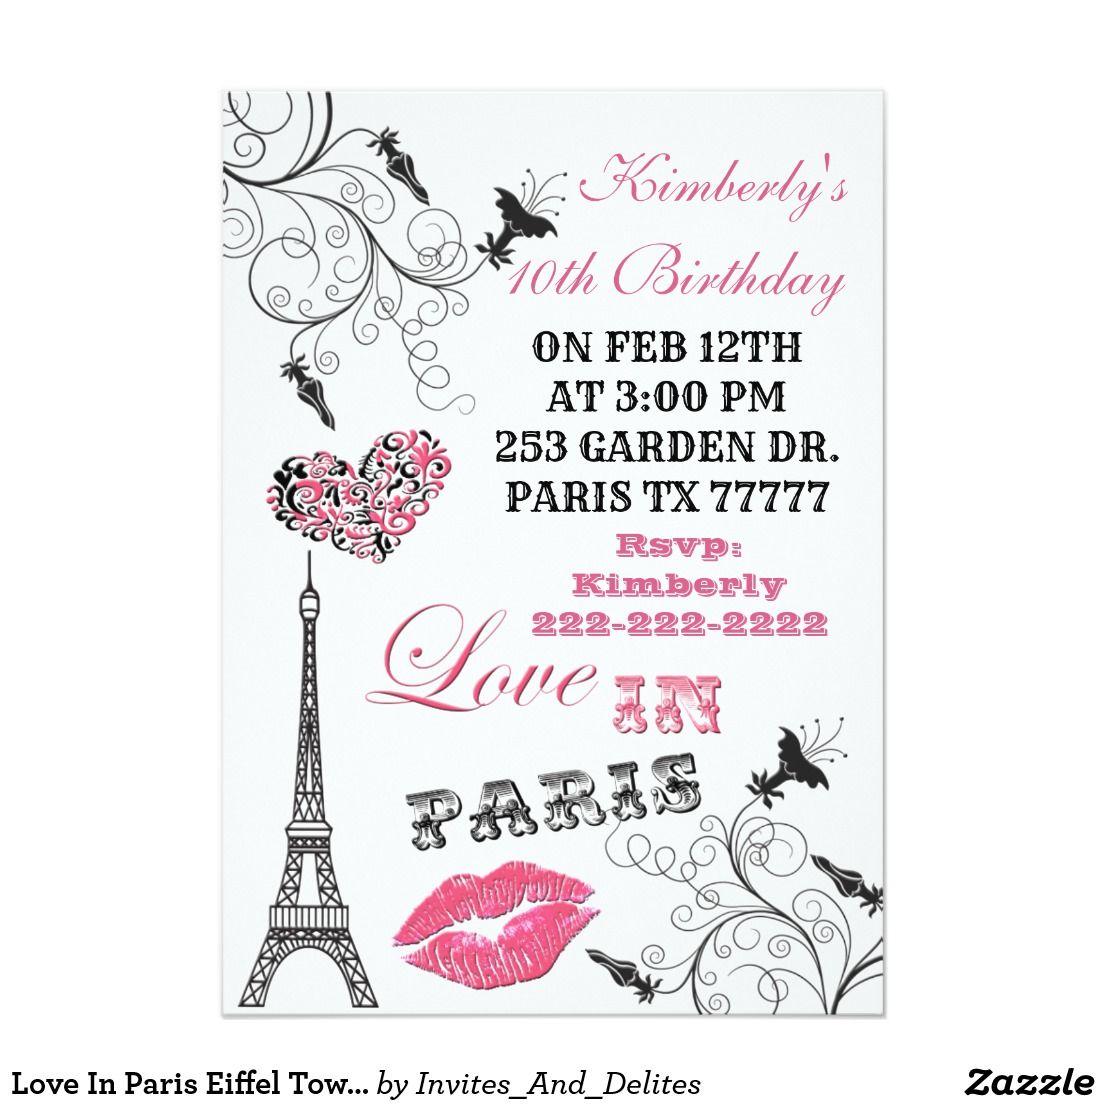 Love In Paris Eiffel Tower Party Invitation | .Zazzle | Pinterest ...